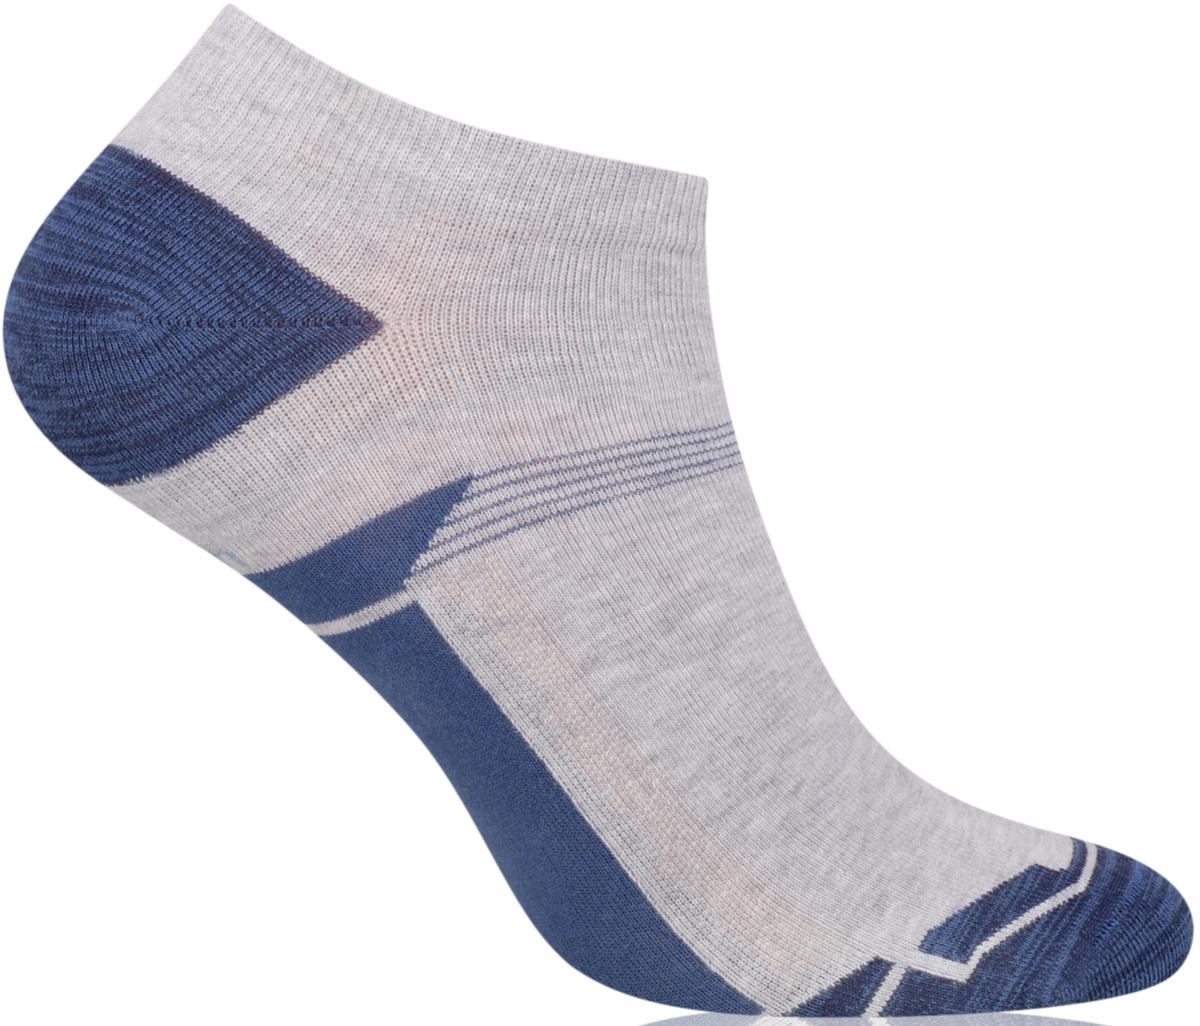 Носки для мальчика Steven, цвет: серый, джинсовый. 004 (RD127). Размер 35/37 steven levenkron cutting – understanding & overcoming self– mutilation revised